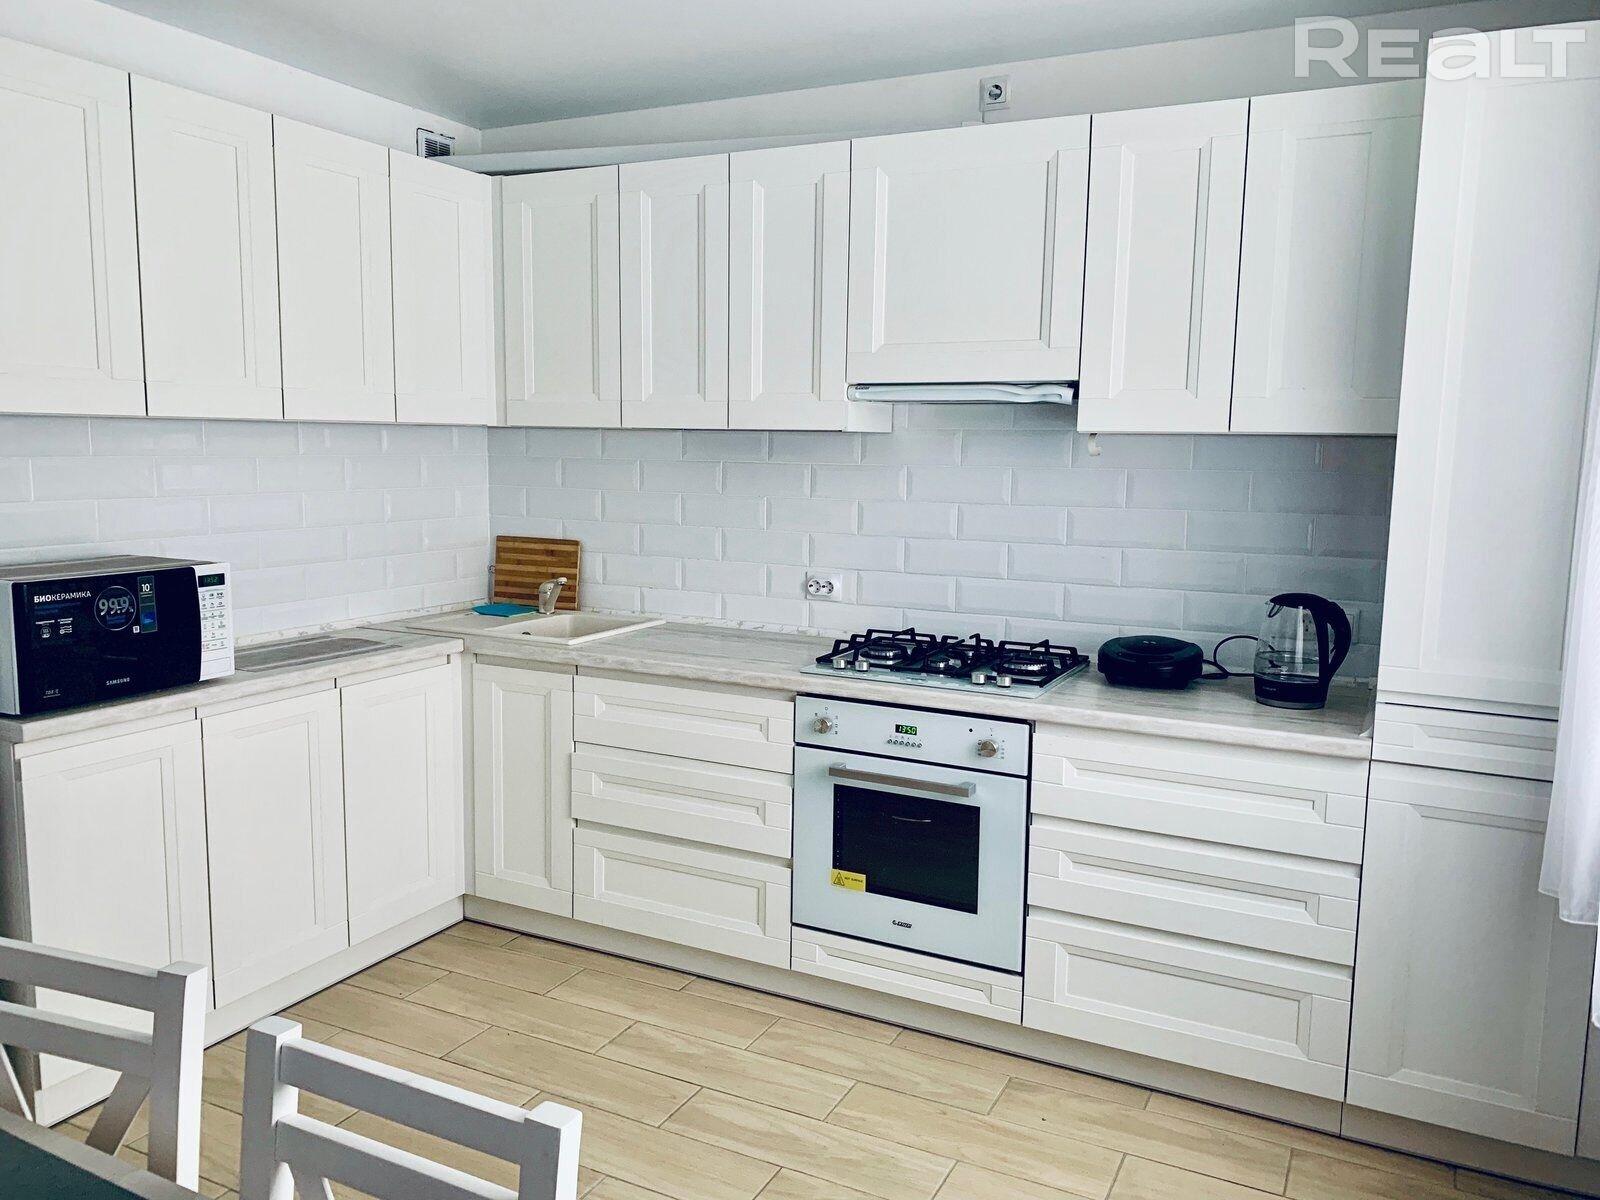 Продажа 2-х комнатной квартиры в г. Гомеле, ул. Мазурова, дом 101-А (р-н Мельников луг). Цена 117 509 руб c торгом